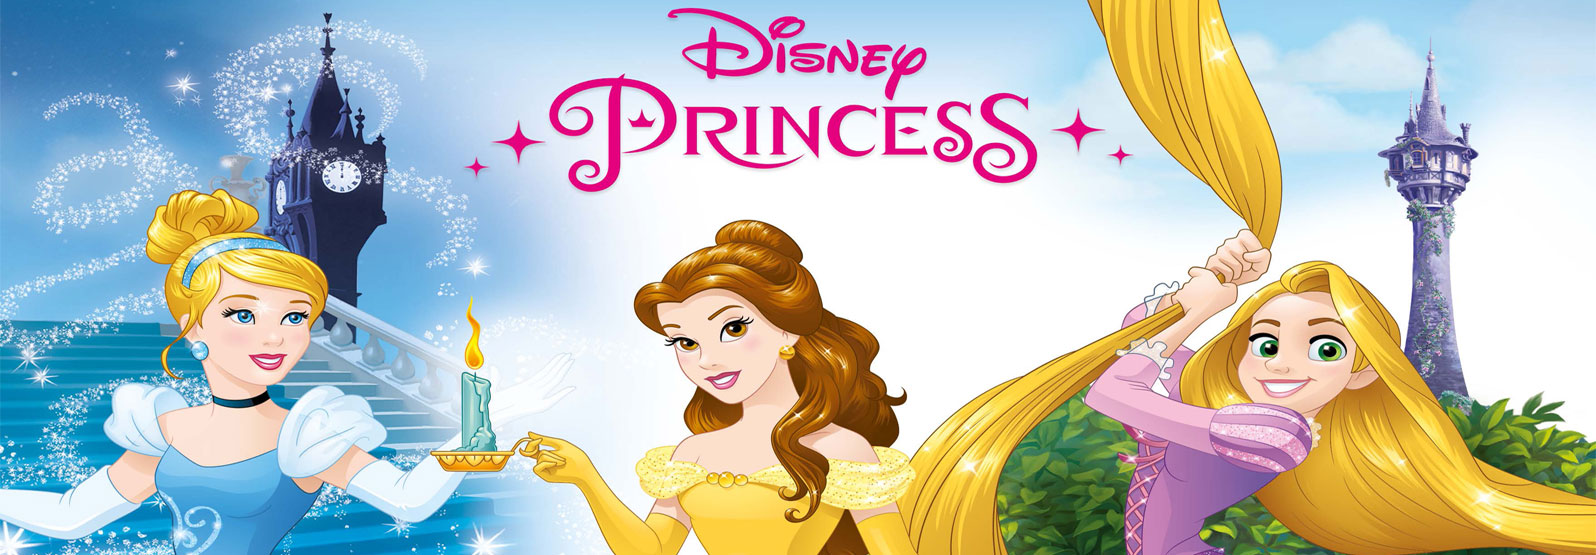 Disney Princess 3